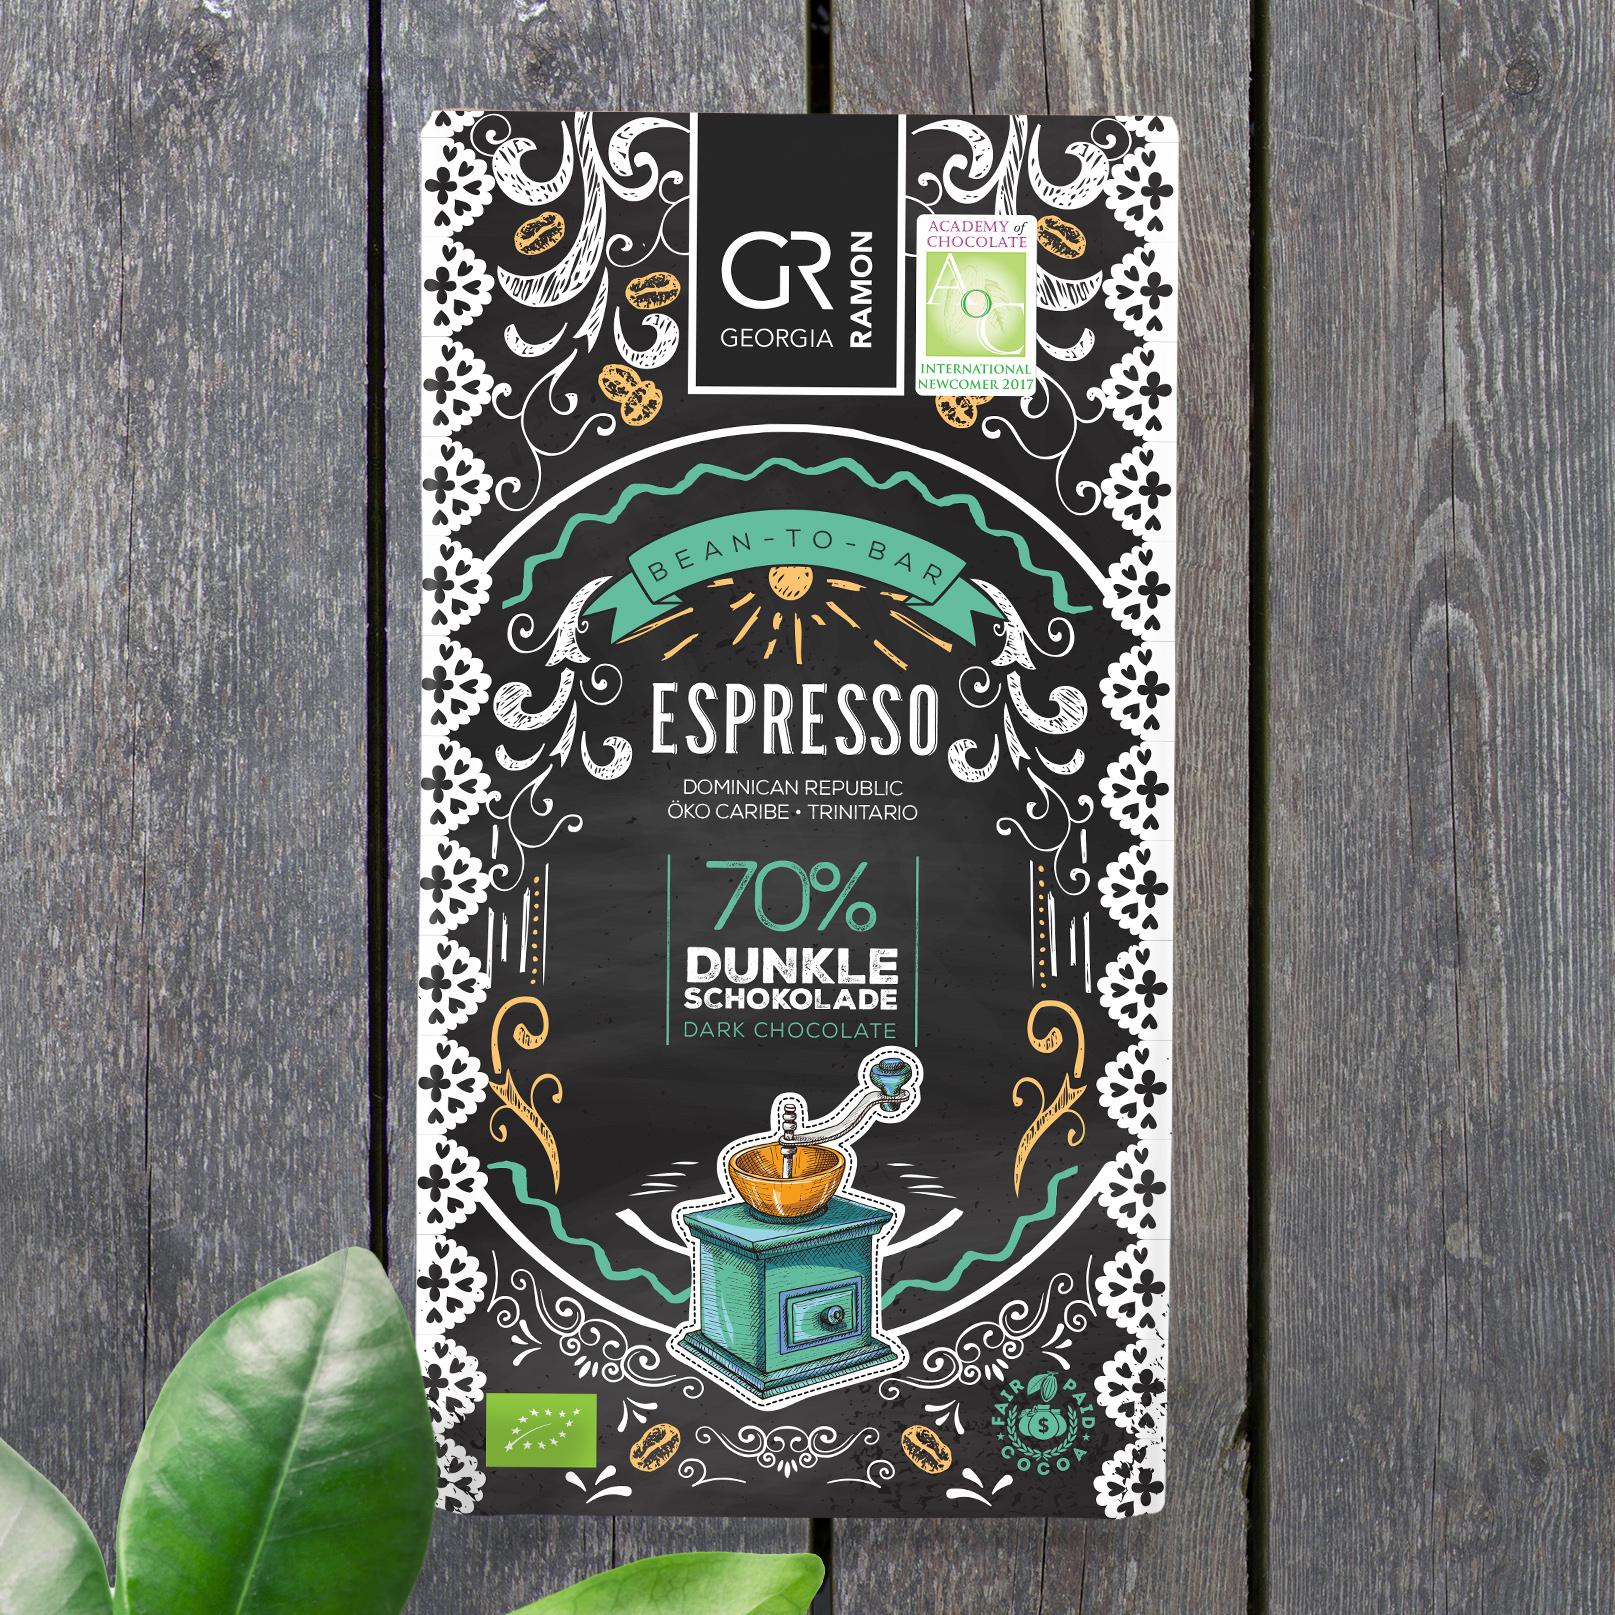 GEORGIA RAMON | Dunkle Schokolade »Espresso« 70% | BIO